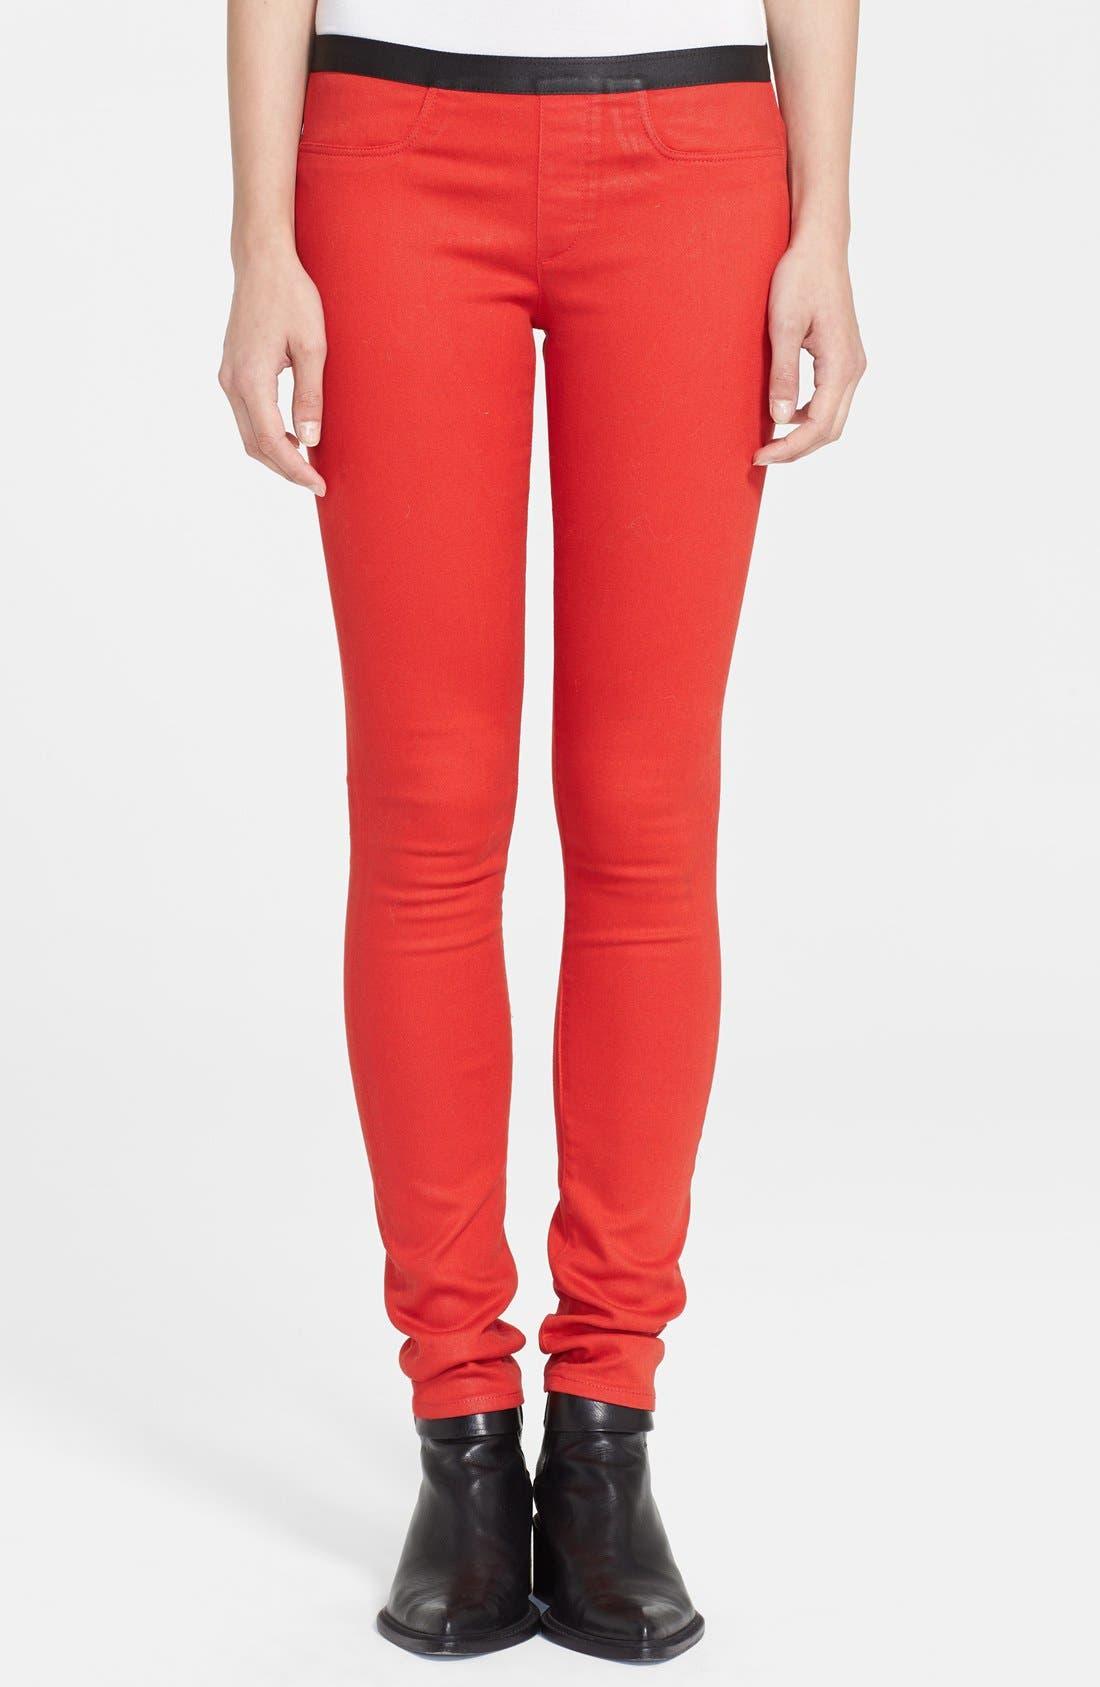 'High Gloss' Leggings, Main, color, 600